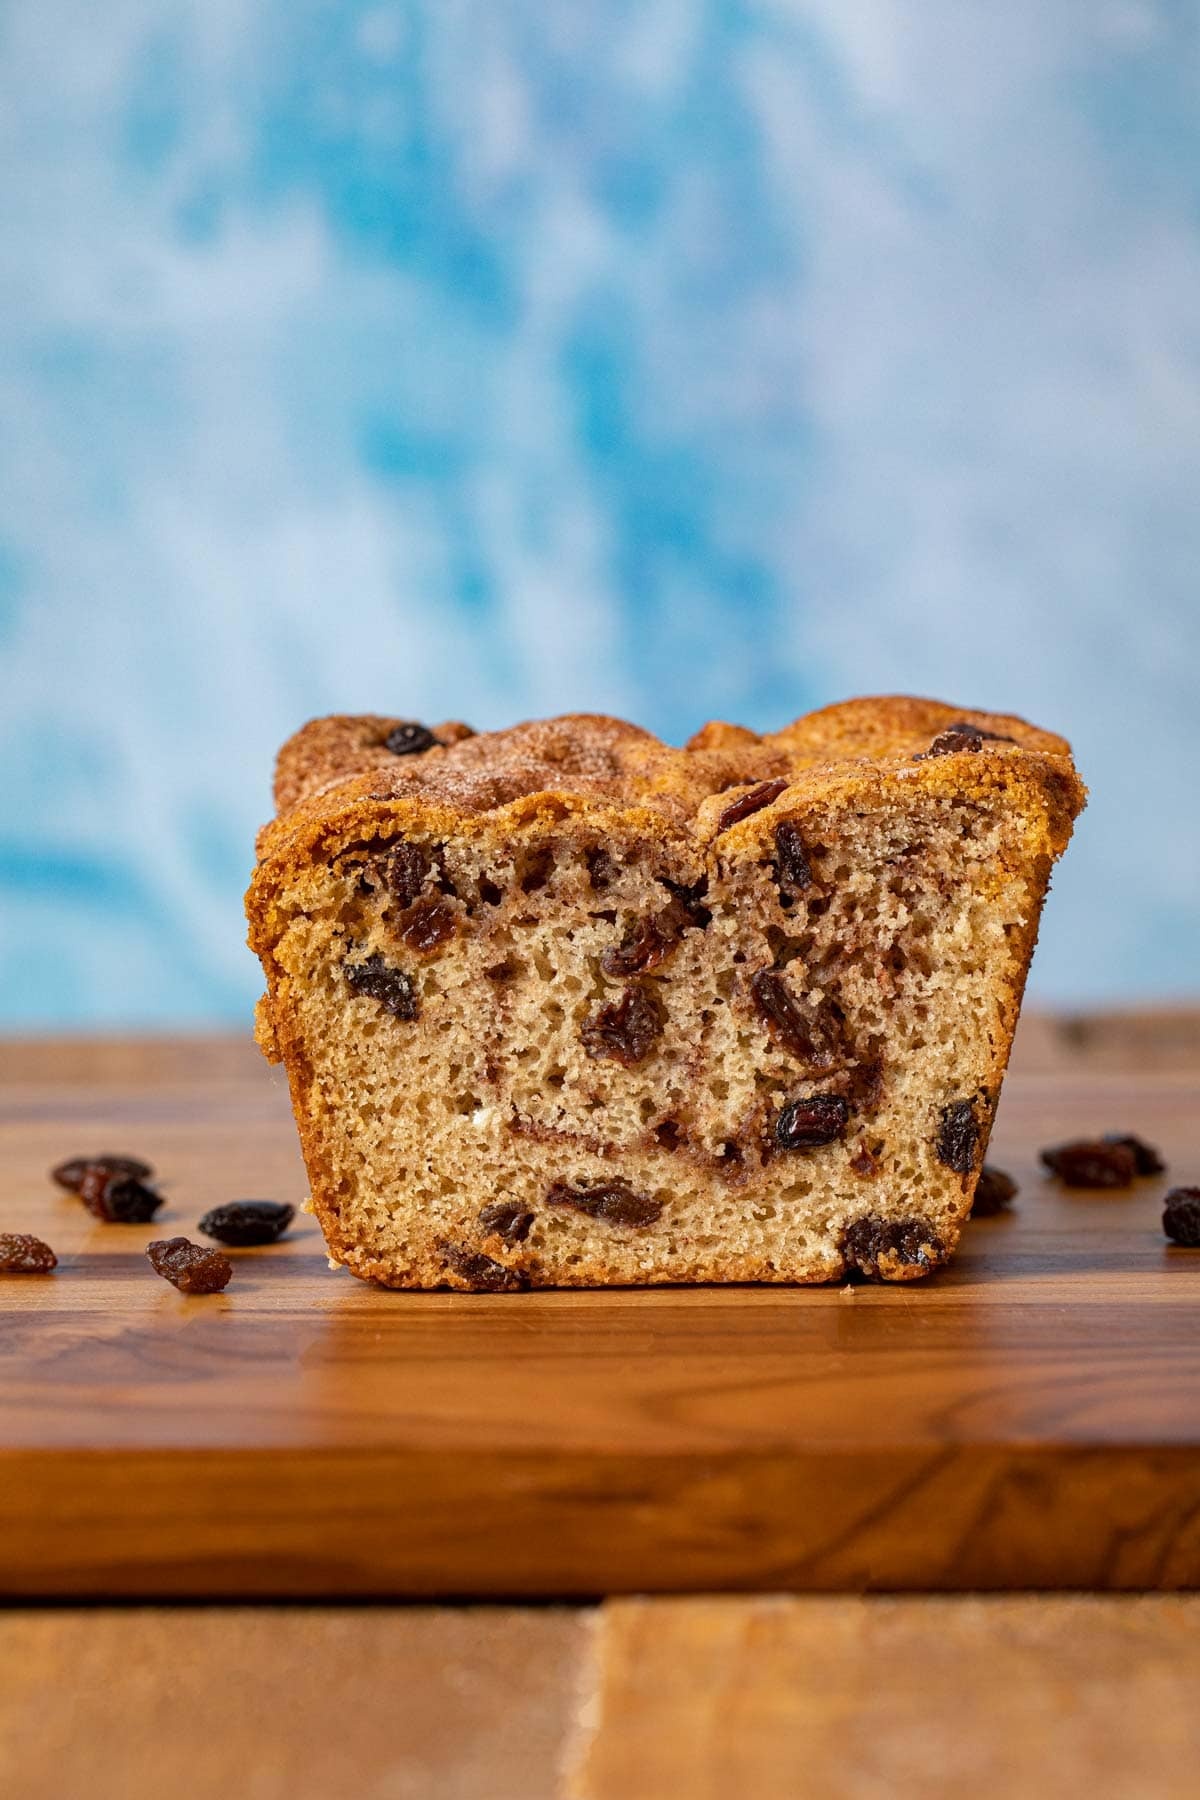 Cinnamon Raisin Bread cross-section on cutting board